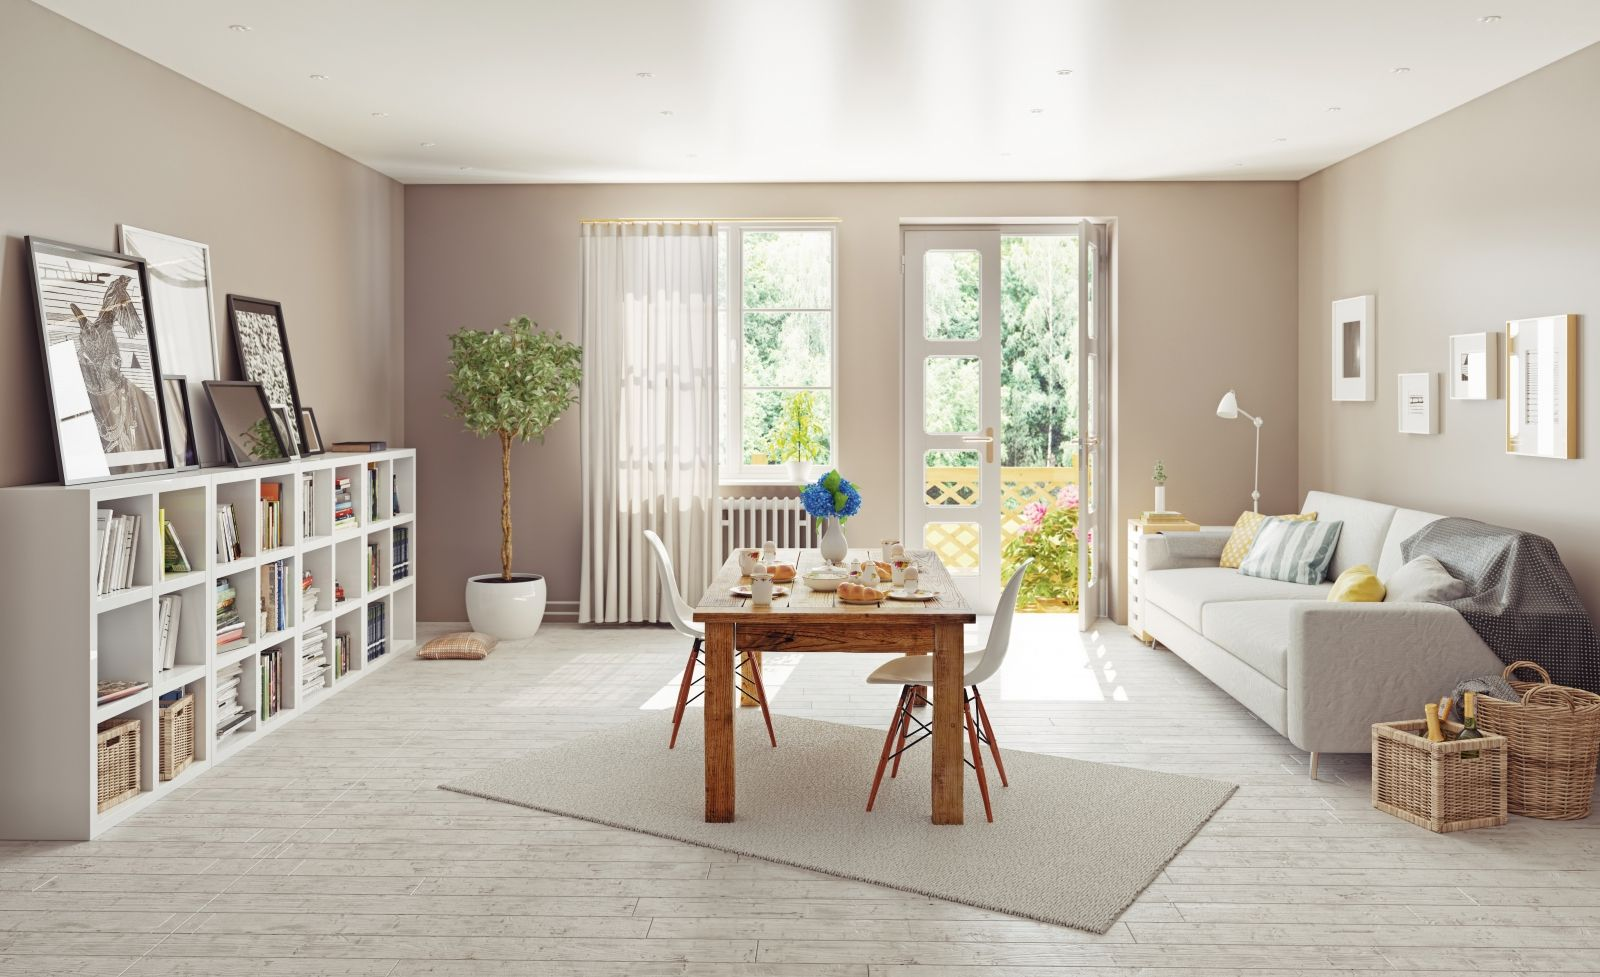 Interieurstyling - Thuis je eigen stijl